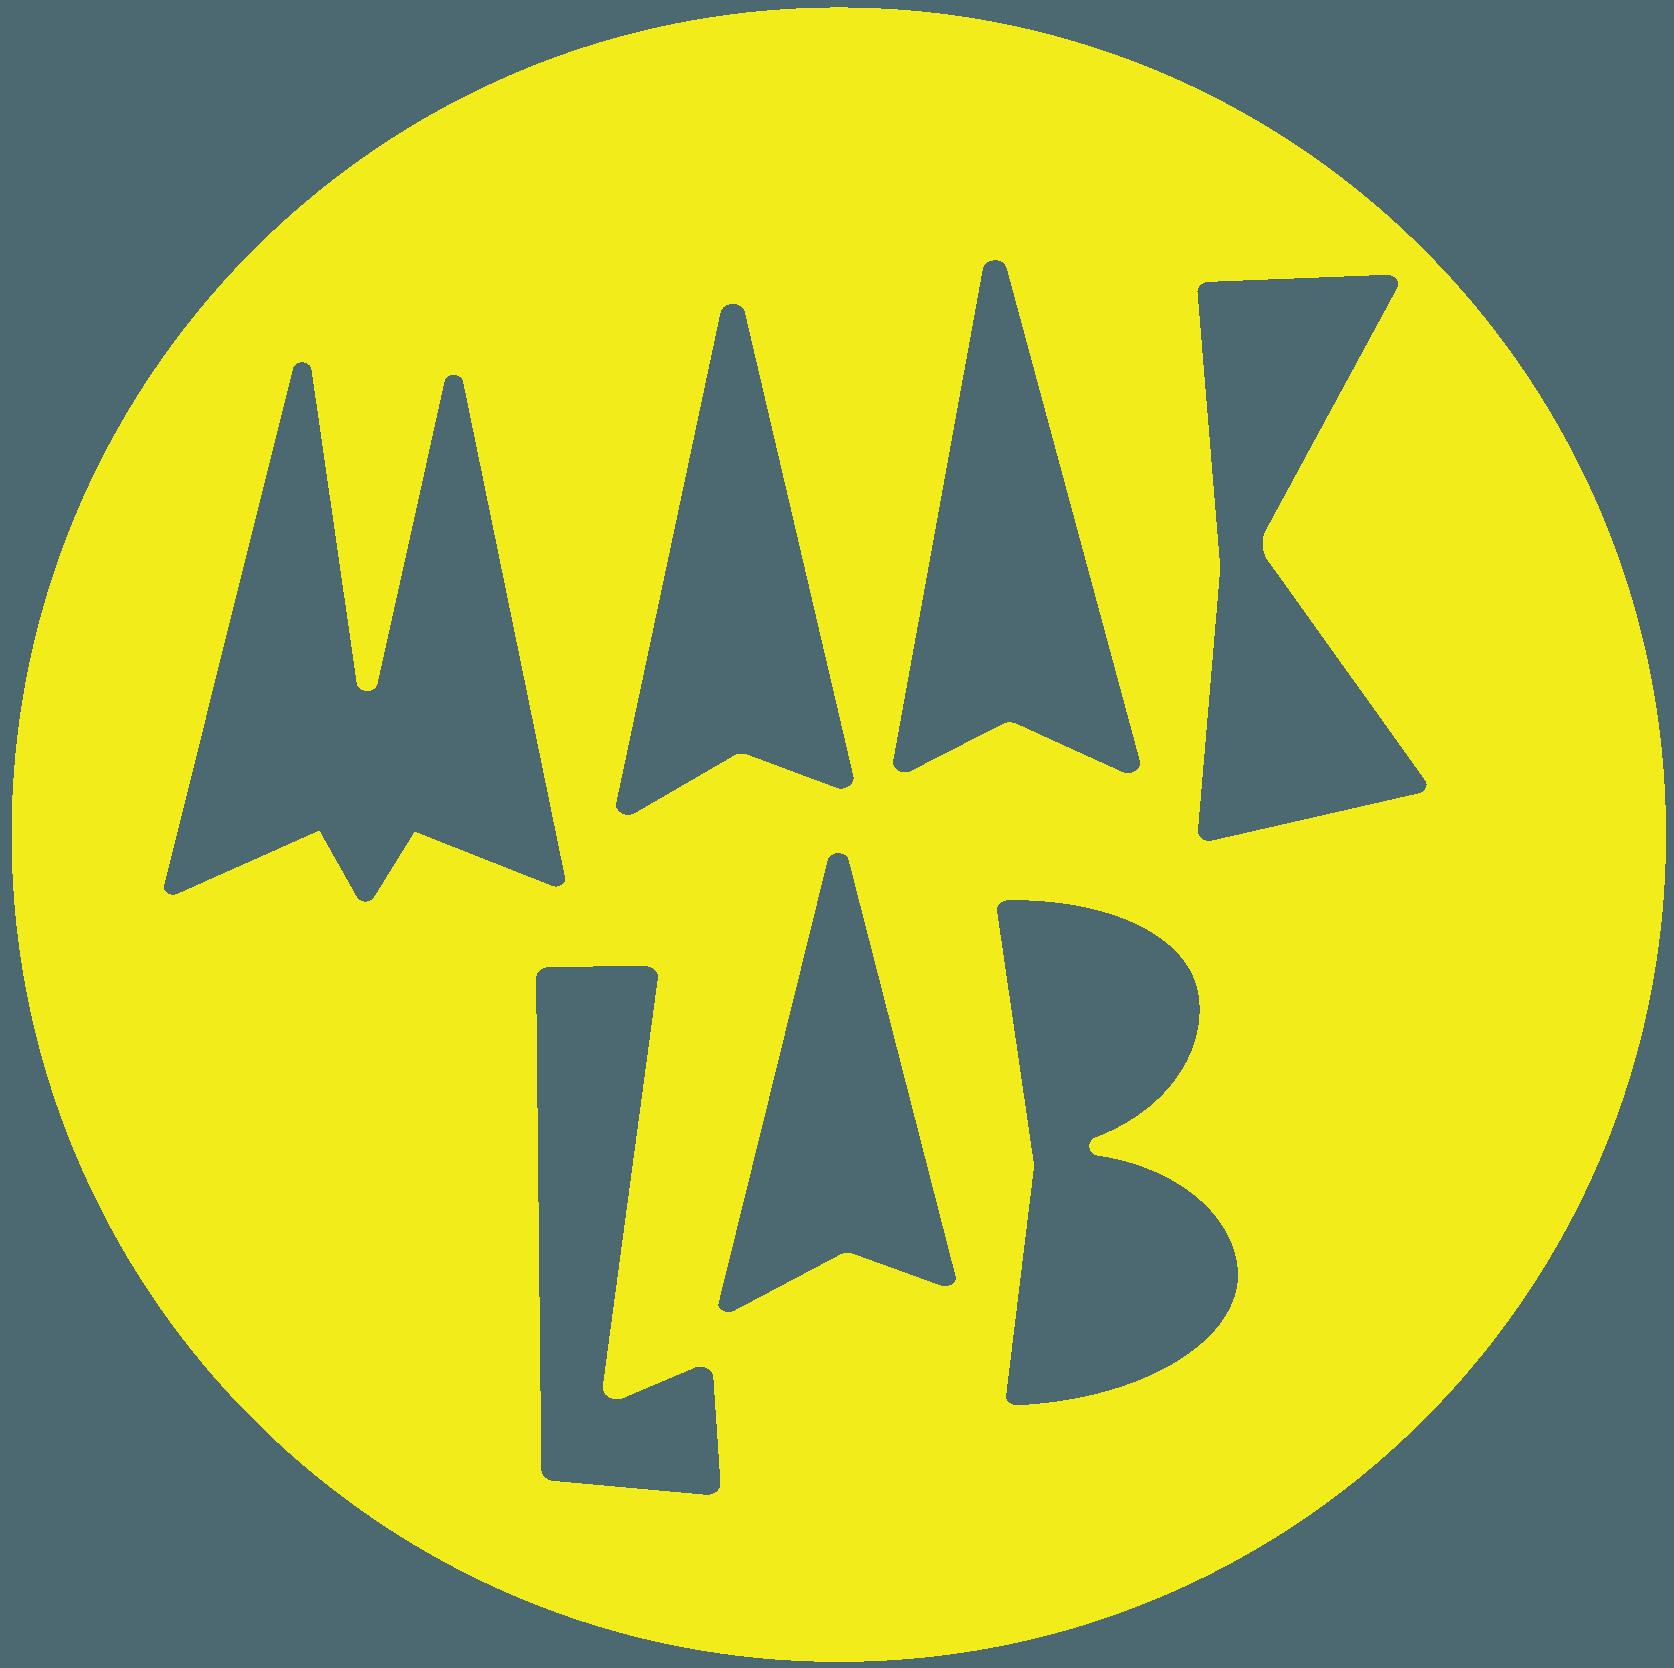 Maak-Lab-logo-geel